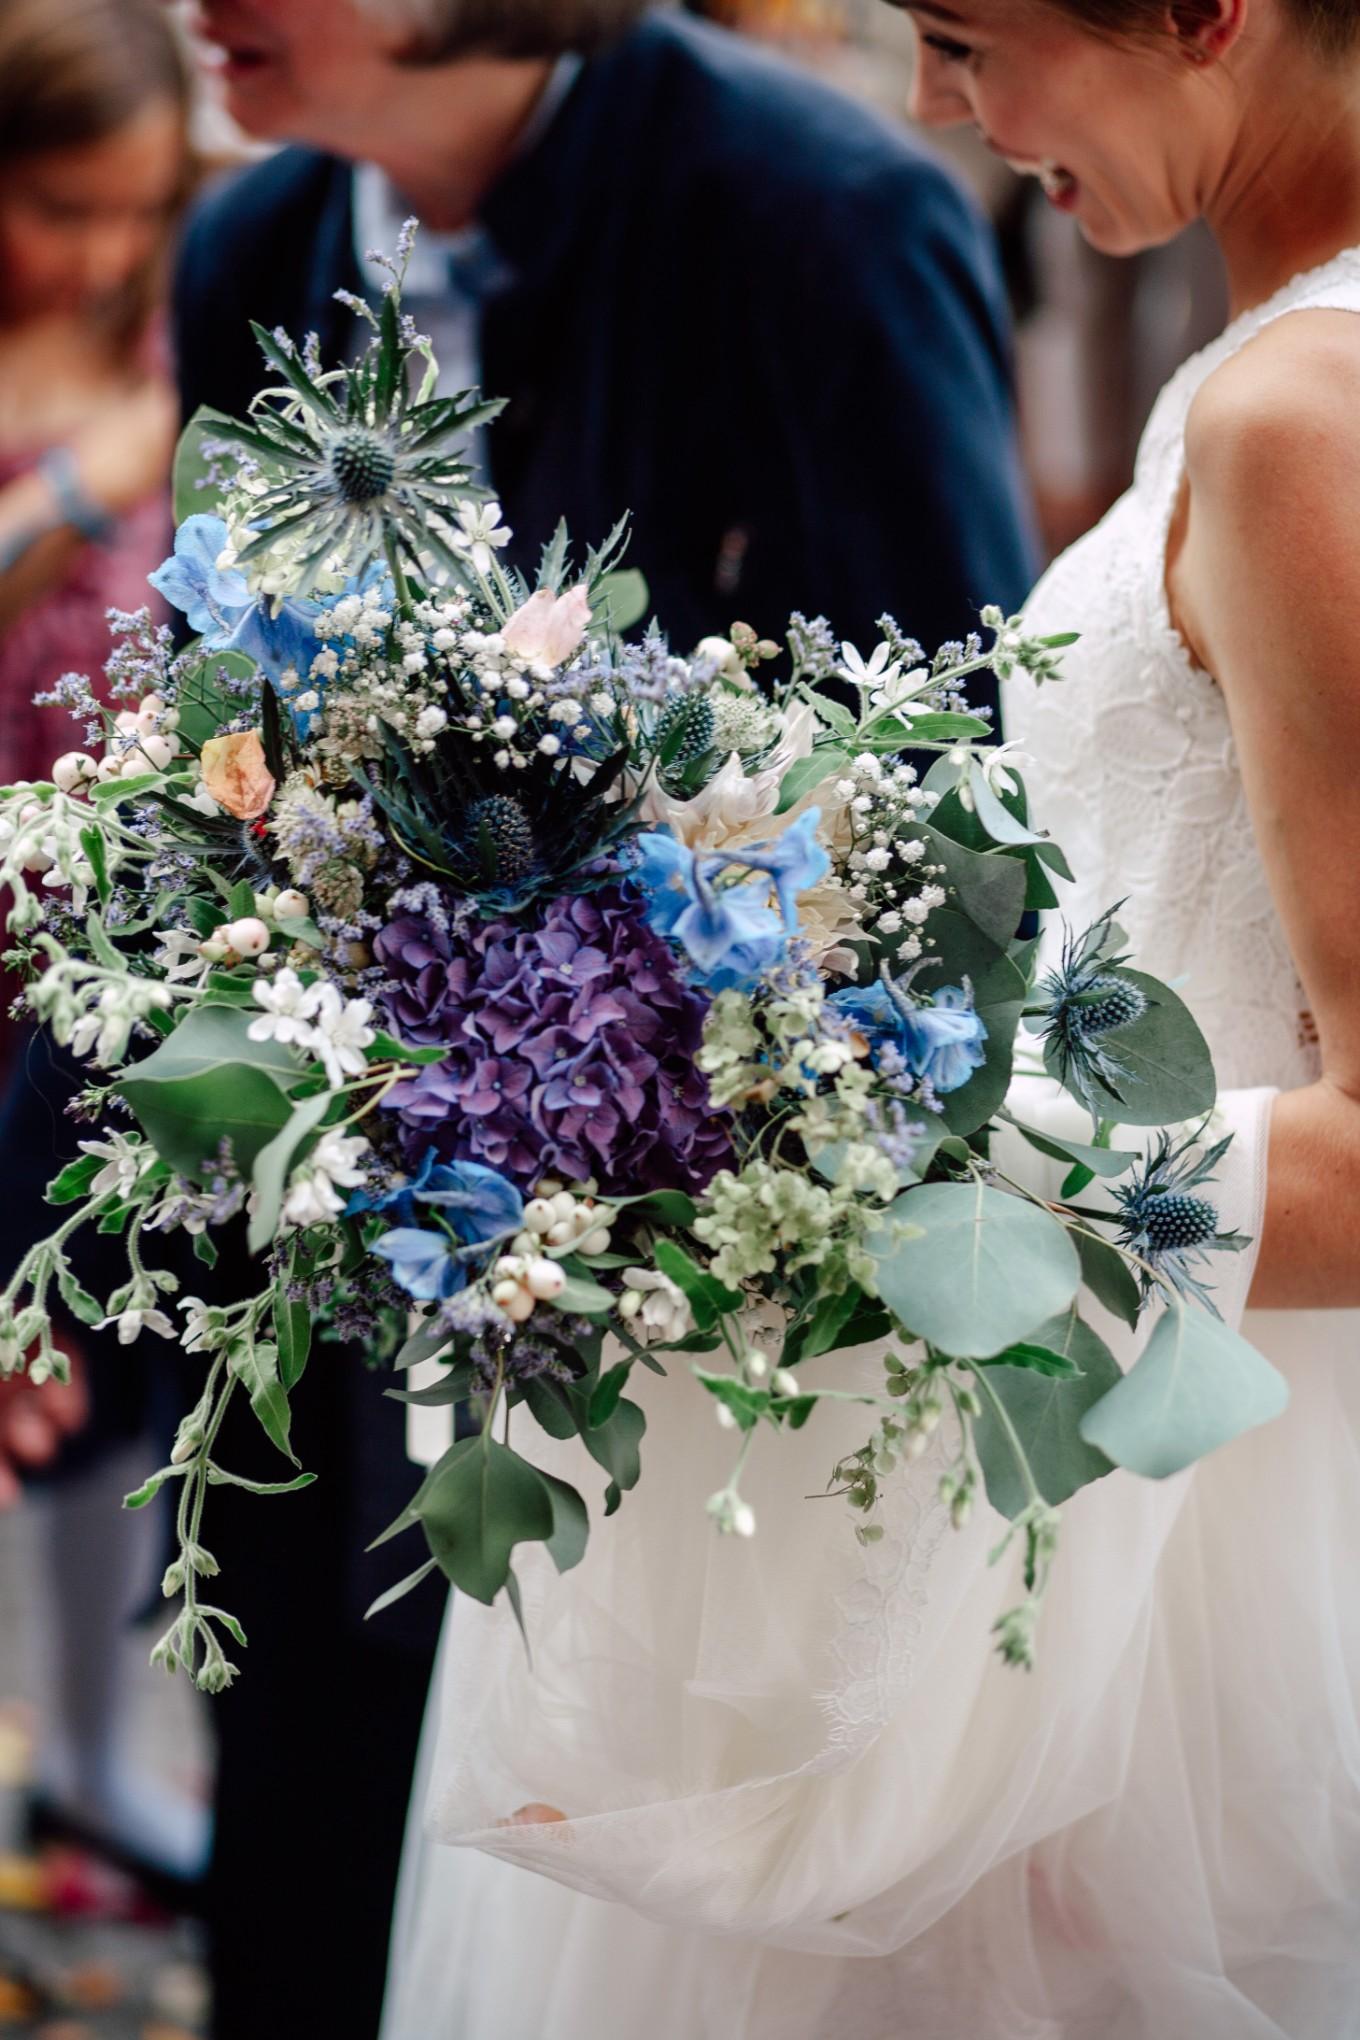 Berlin-Wannsee-Pia-Anna-Christian-Wedding-Photography-ST-29.jpg